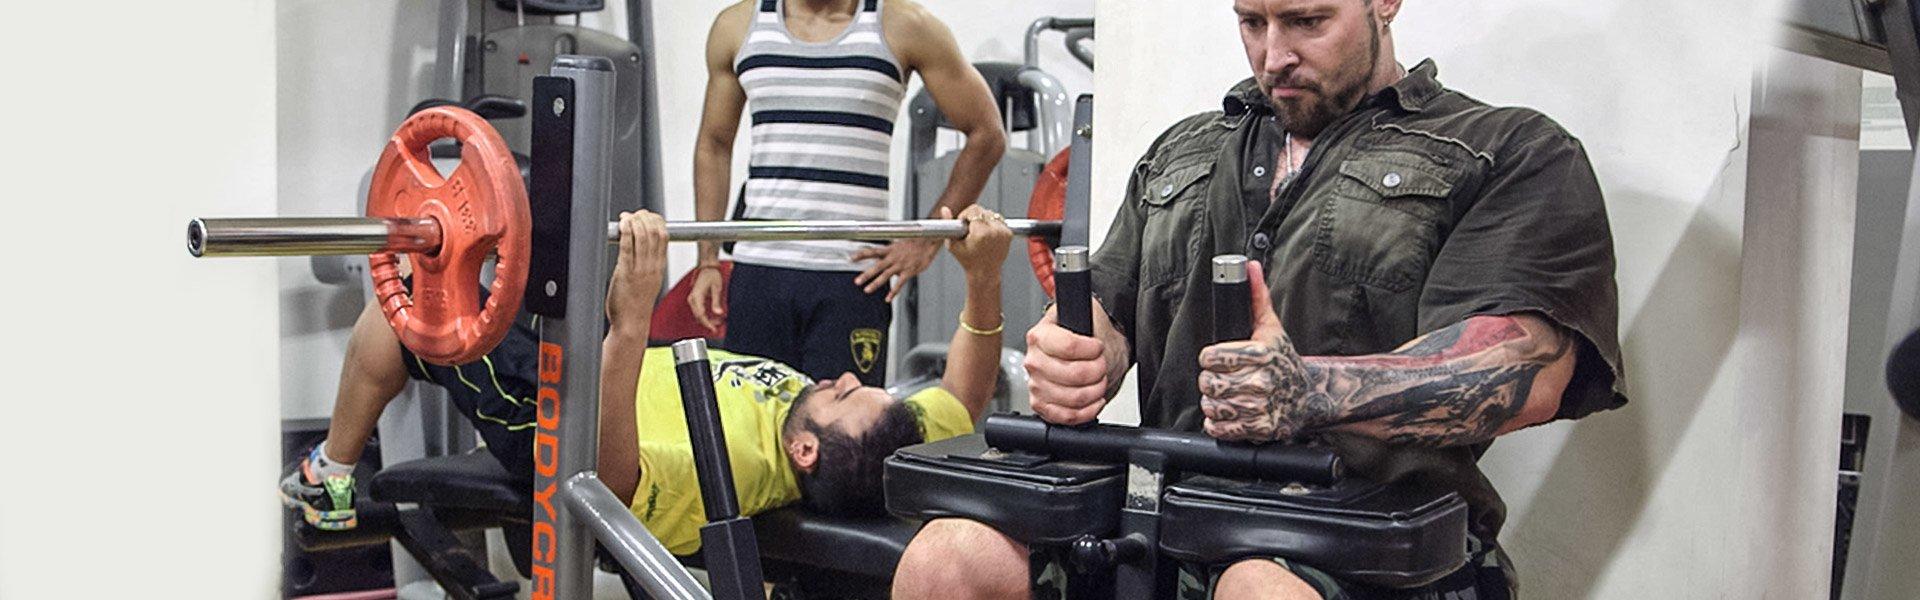 kris gethin muscle building trainer pdf